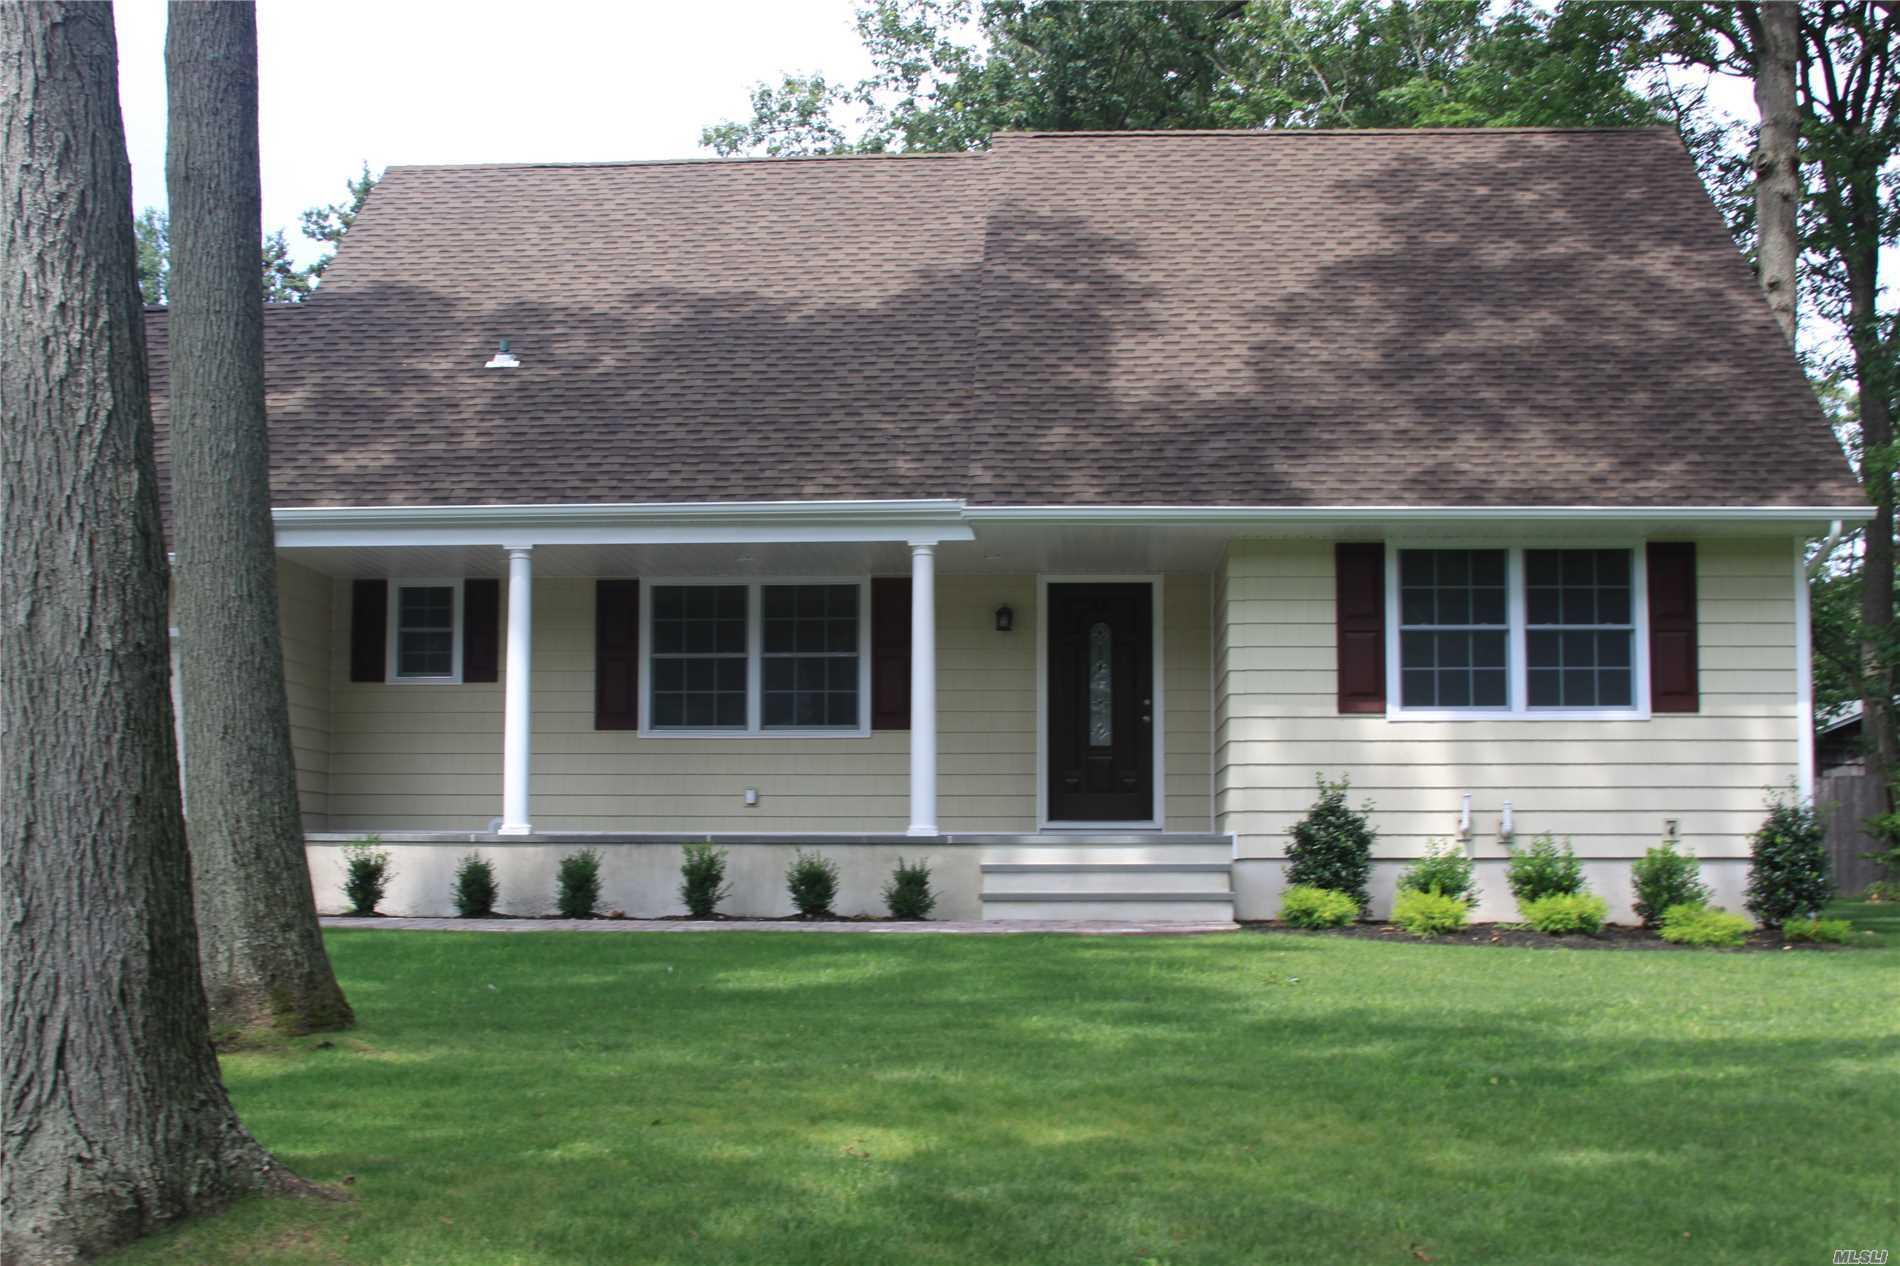 Photo of home for sale at 43 Cinderella Ln, Setauket NY